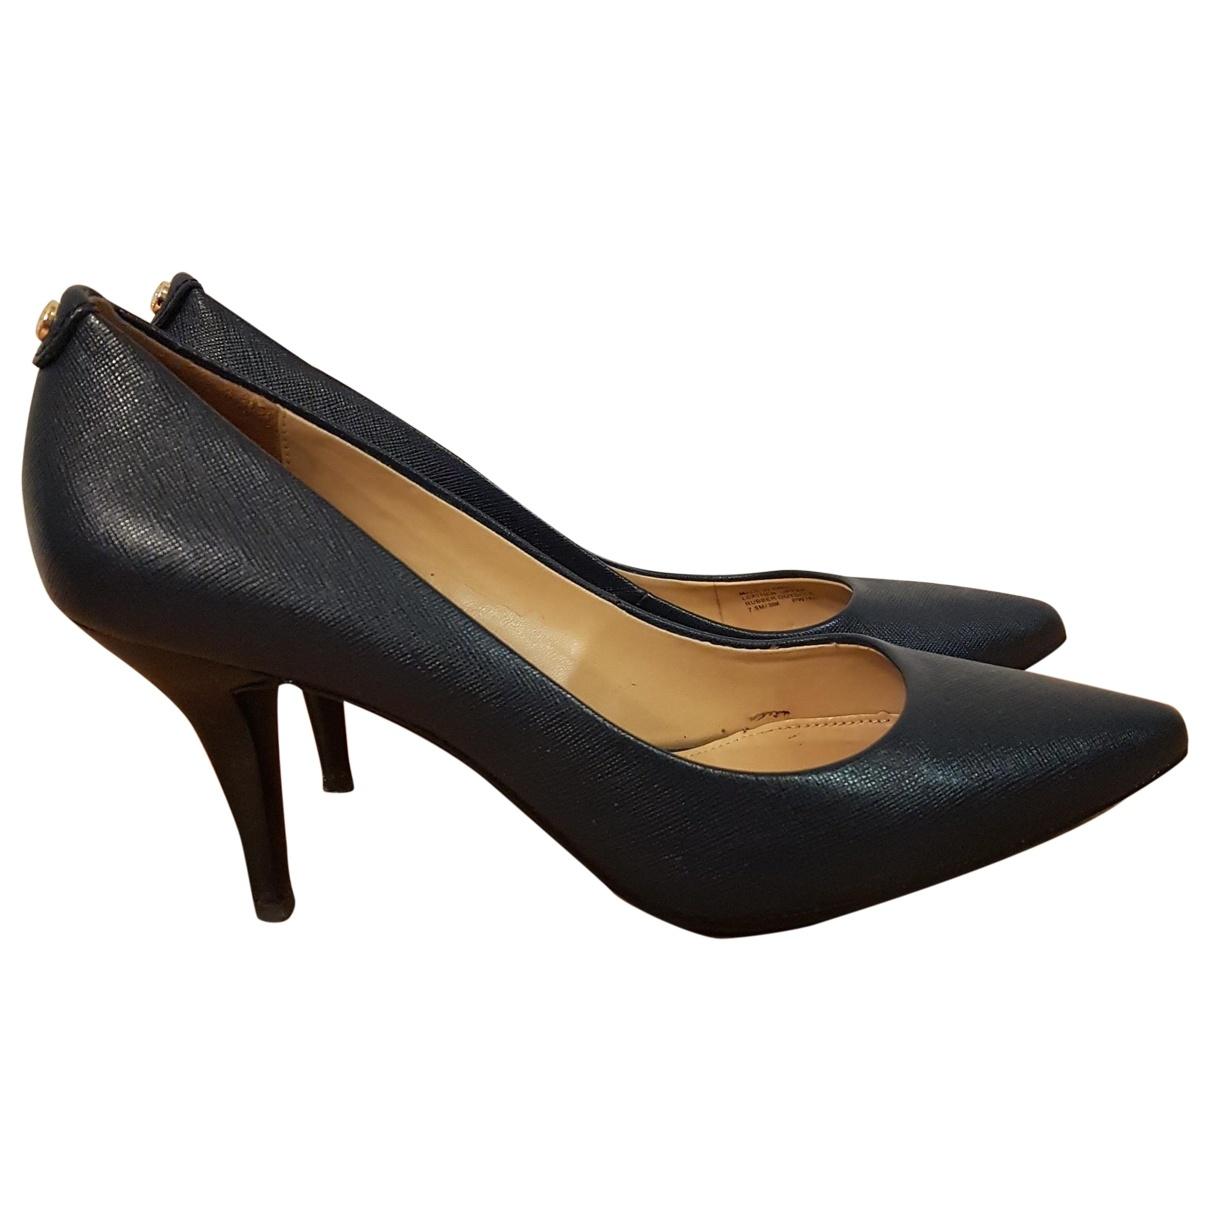 Michael Kors \N Navy Leather Heels for Women 38 EU